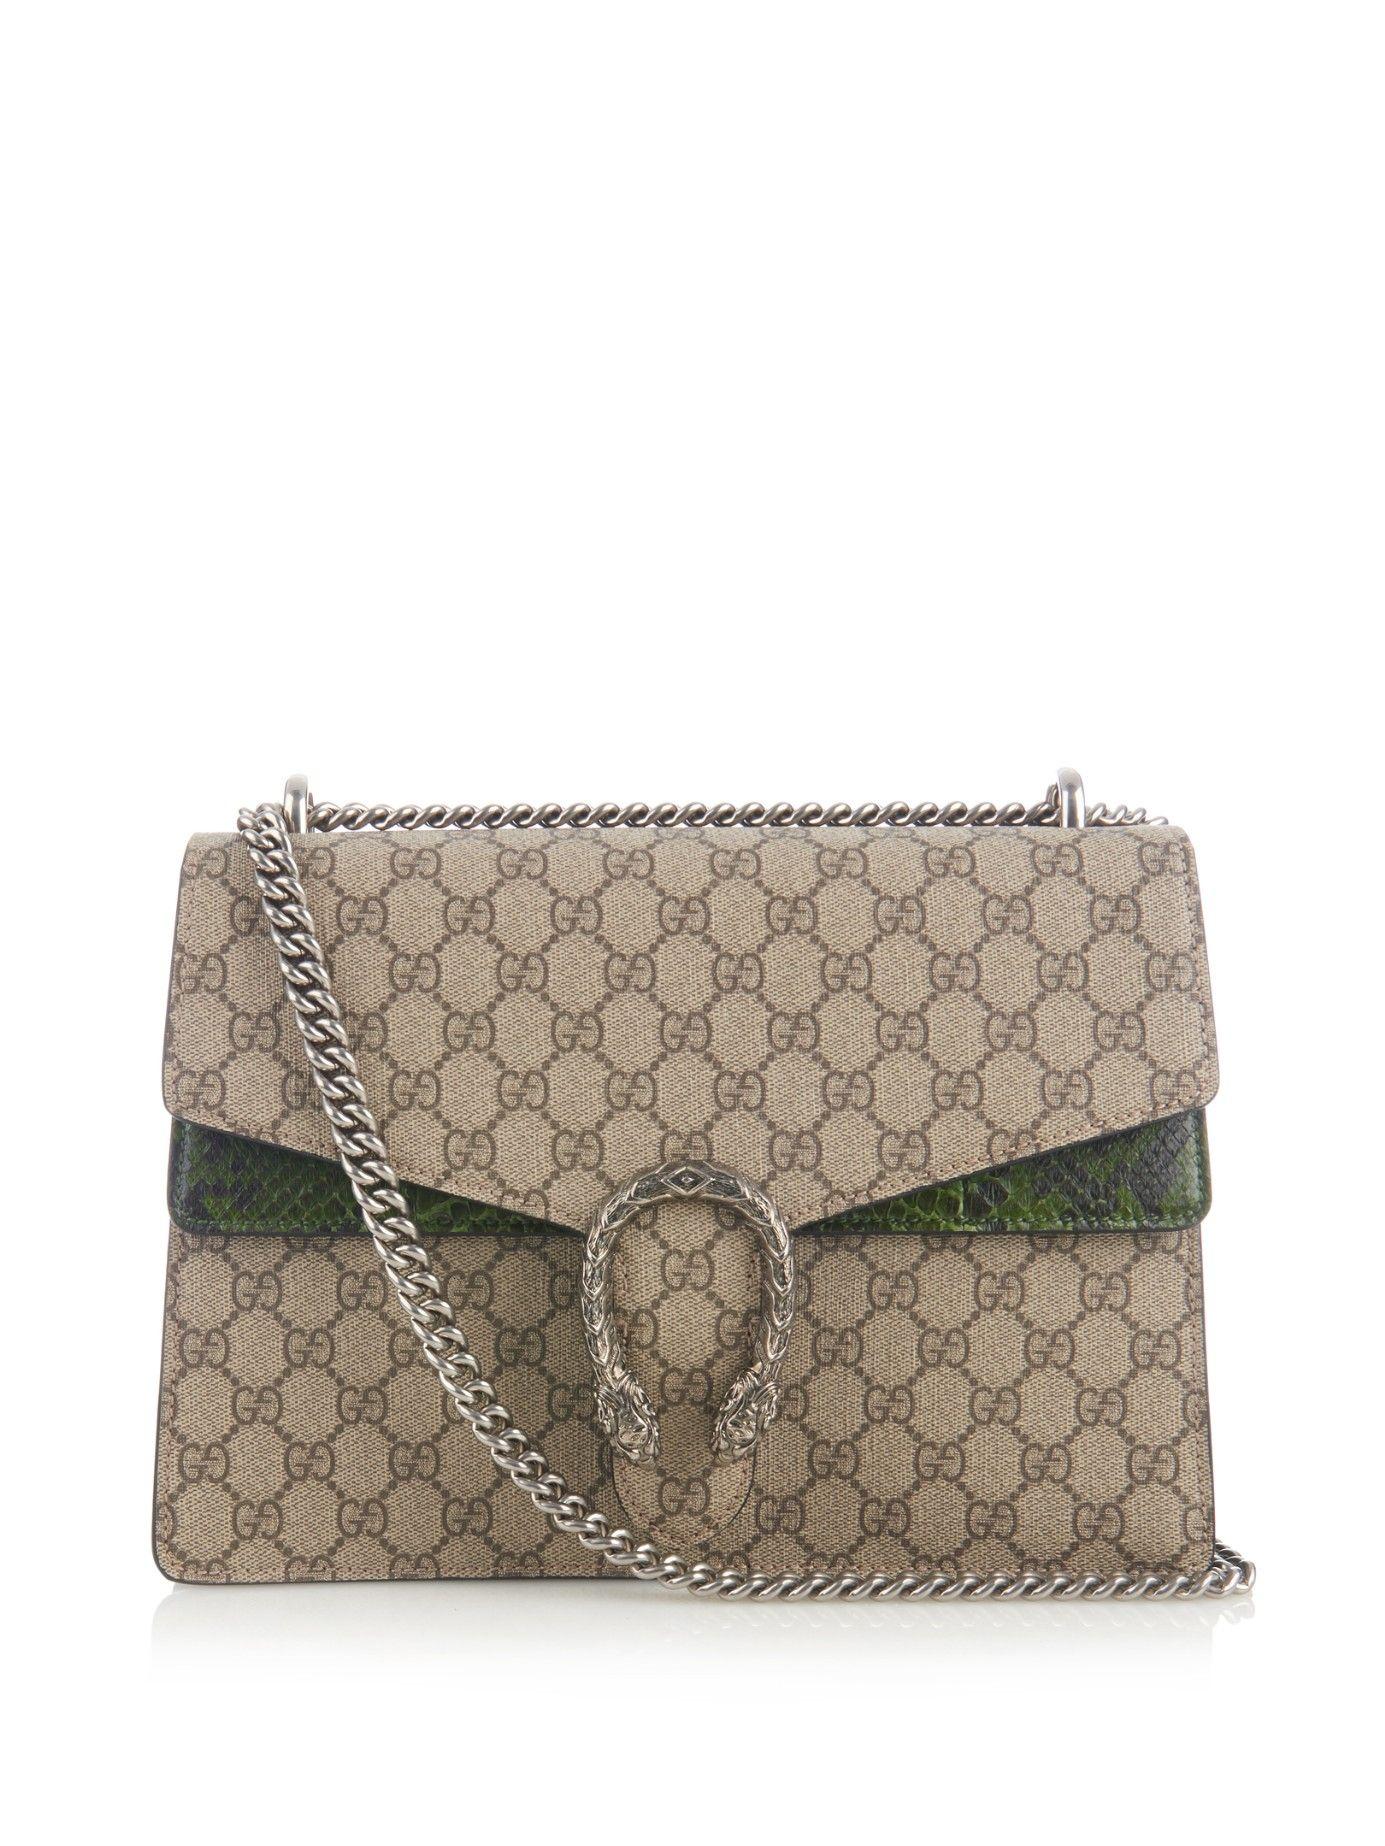 a8630d087ad Dionysus GG Supreme canvas shoulder bag